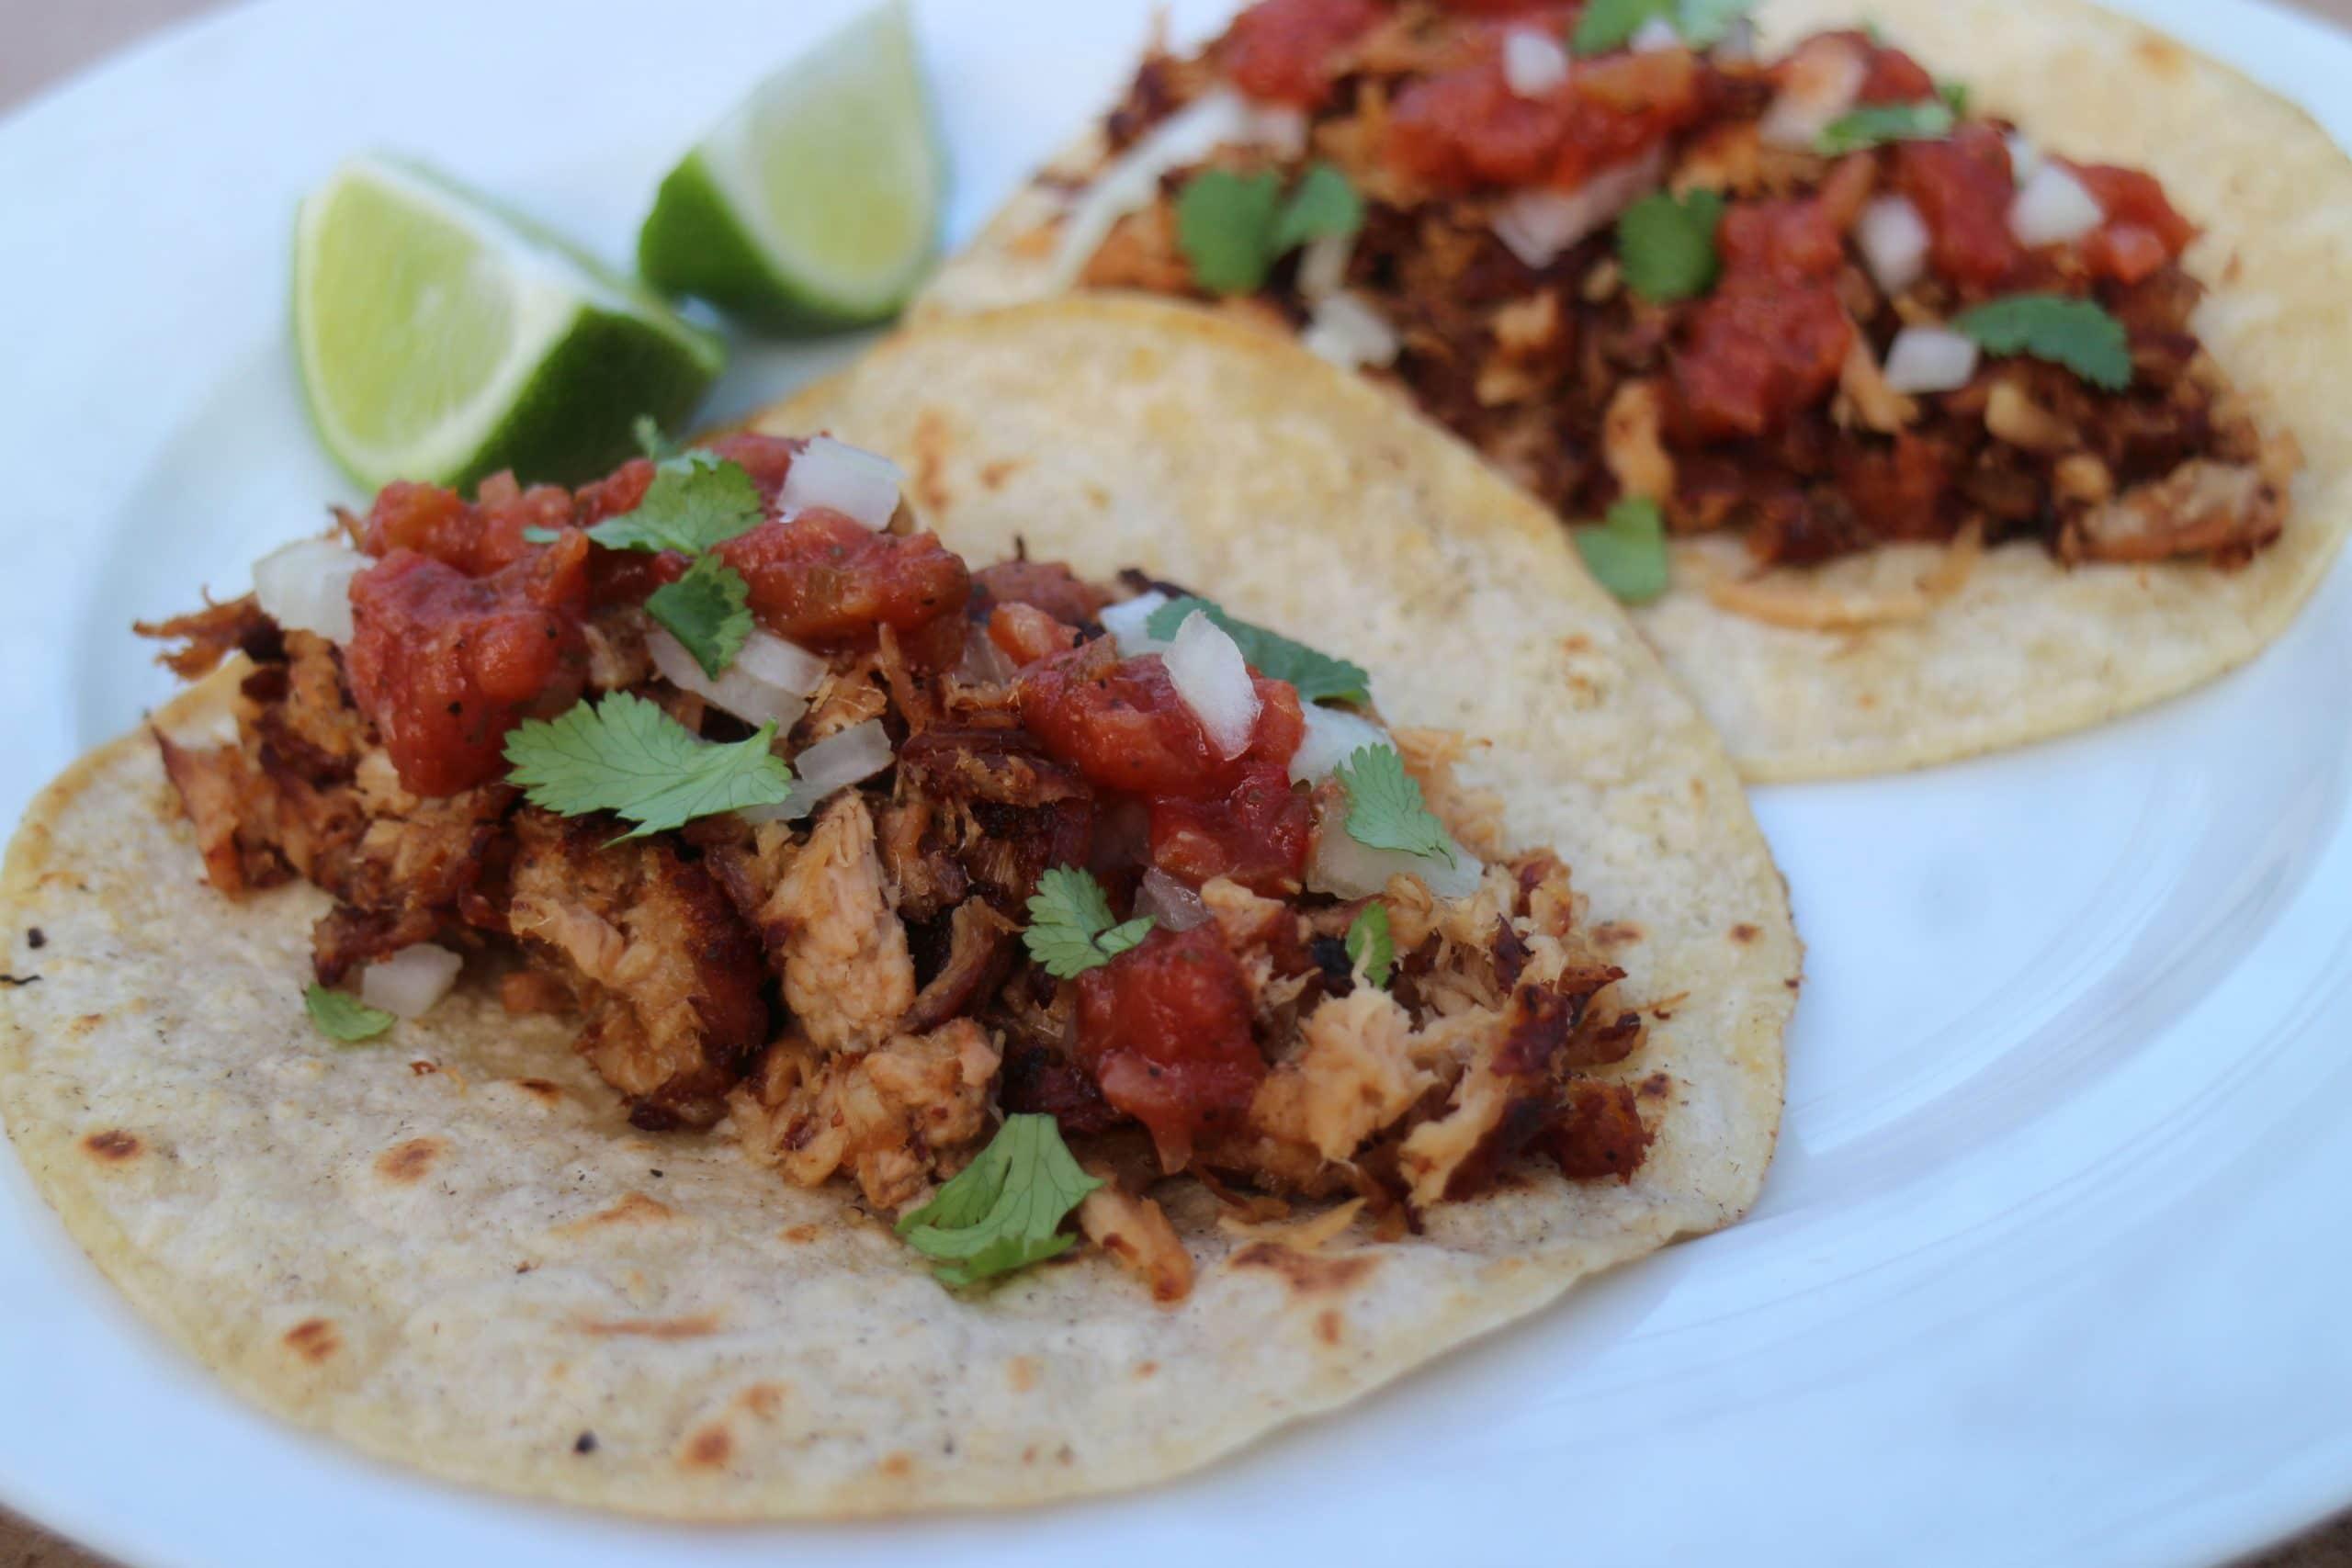 Pulled Pork Taco Recipe